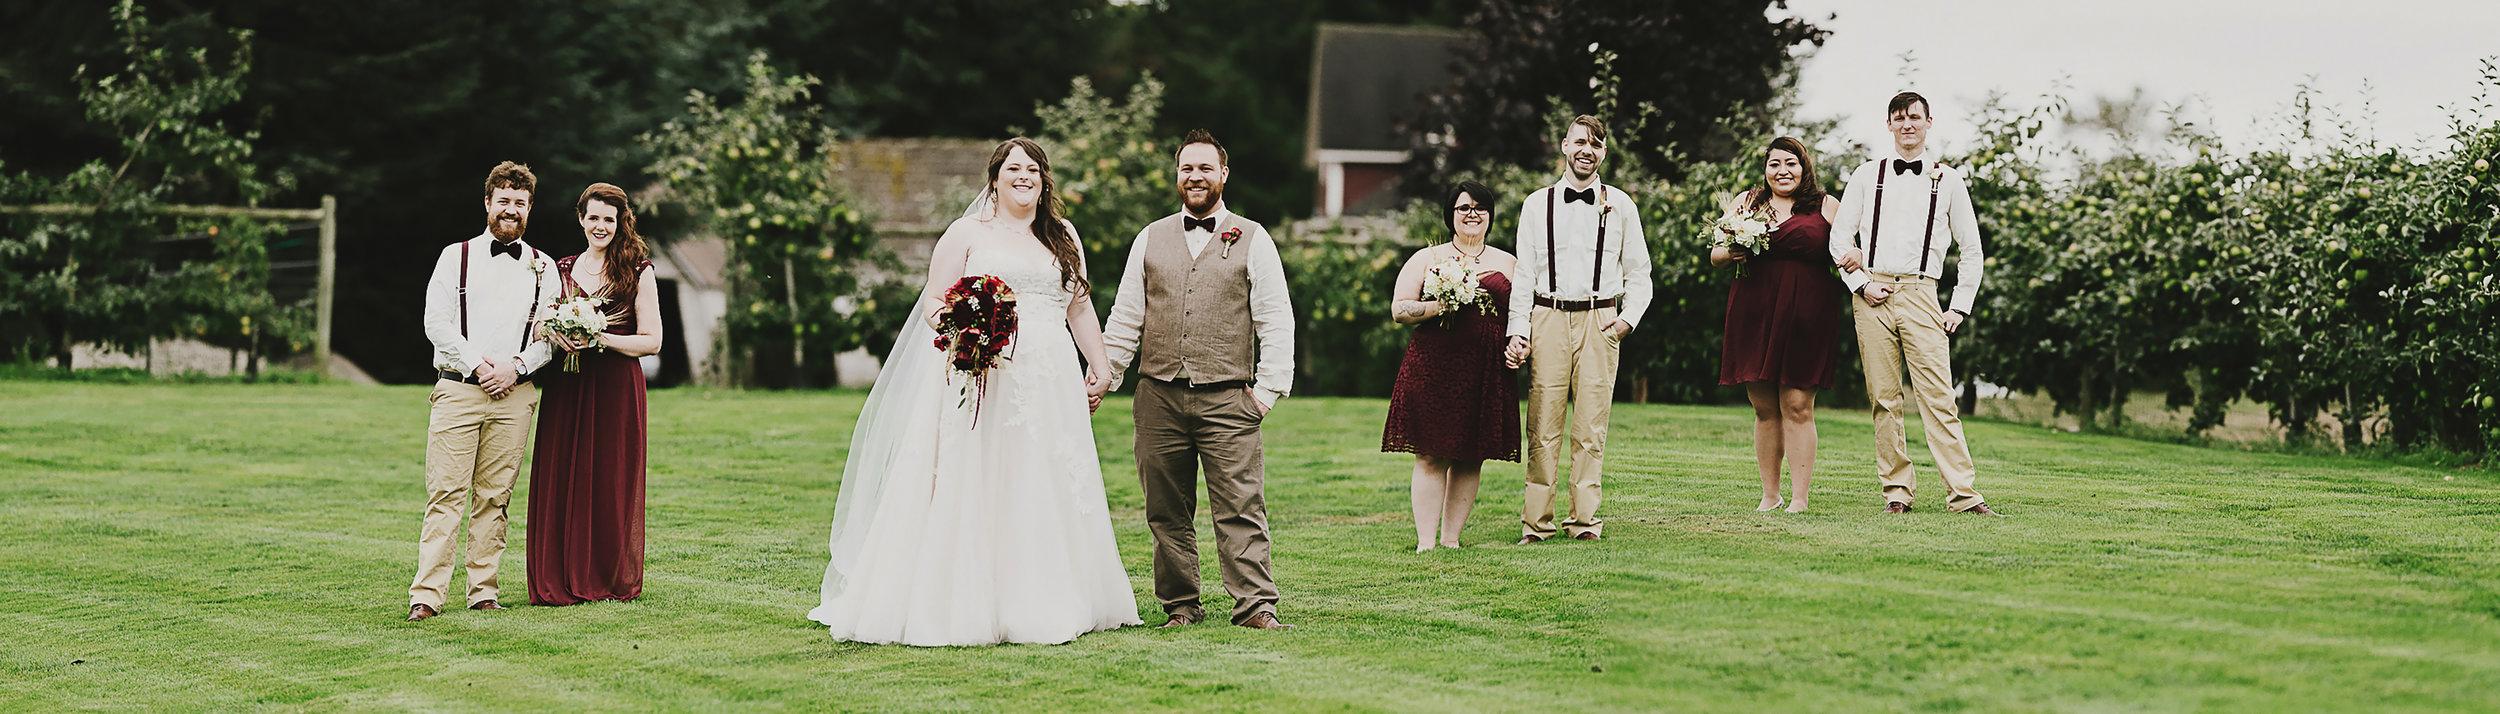 Swan Trail Farm Wedding_Sarah Schurman + Brian Skadan_Snohomish Wedding_Kelsey Lane Photography-5851-Pano copy.jpg